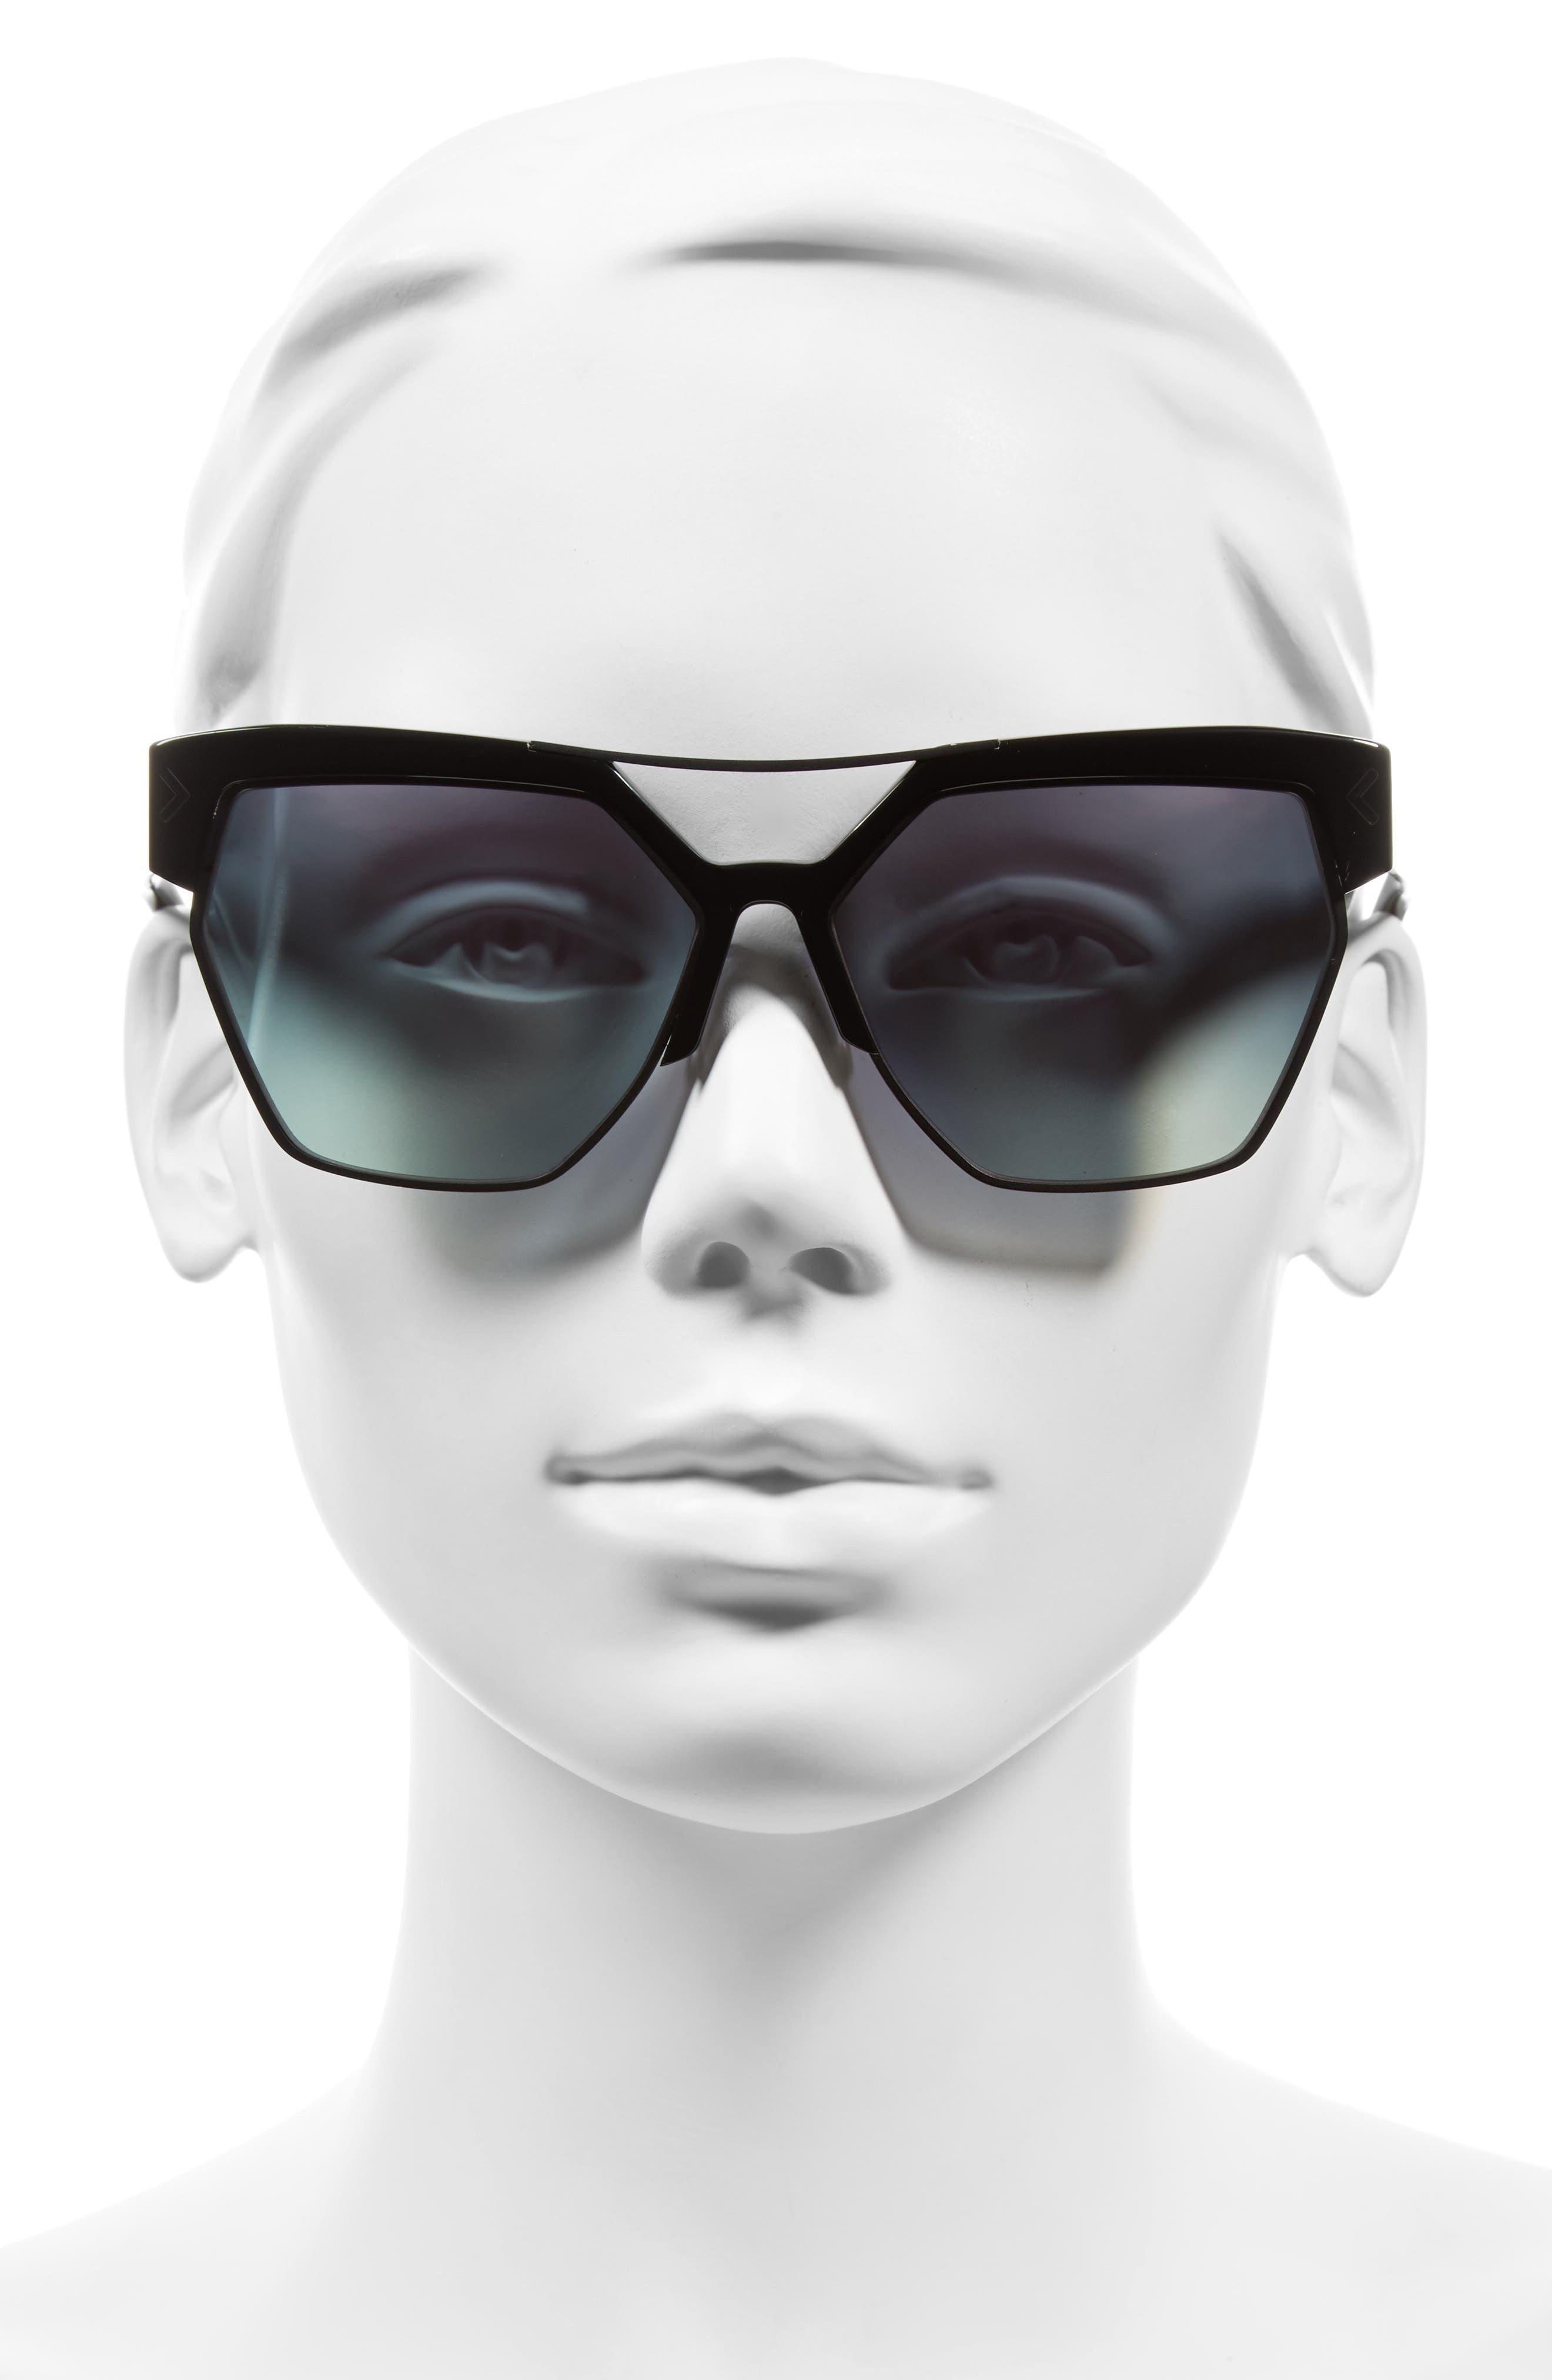 55mm Retro Sunglasses,                             Alternate thumbnail 8, color,